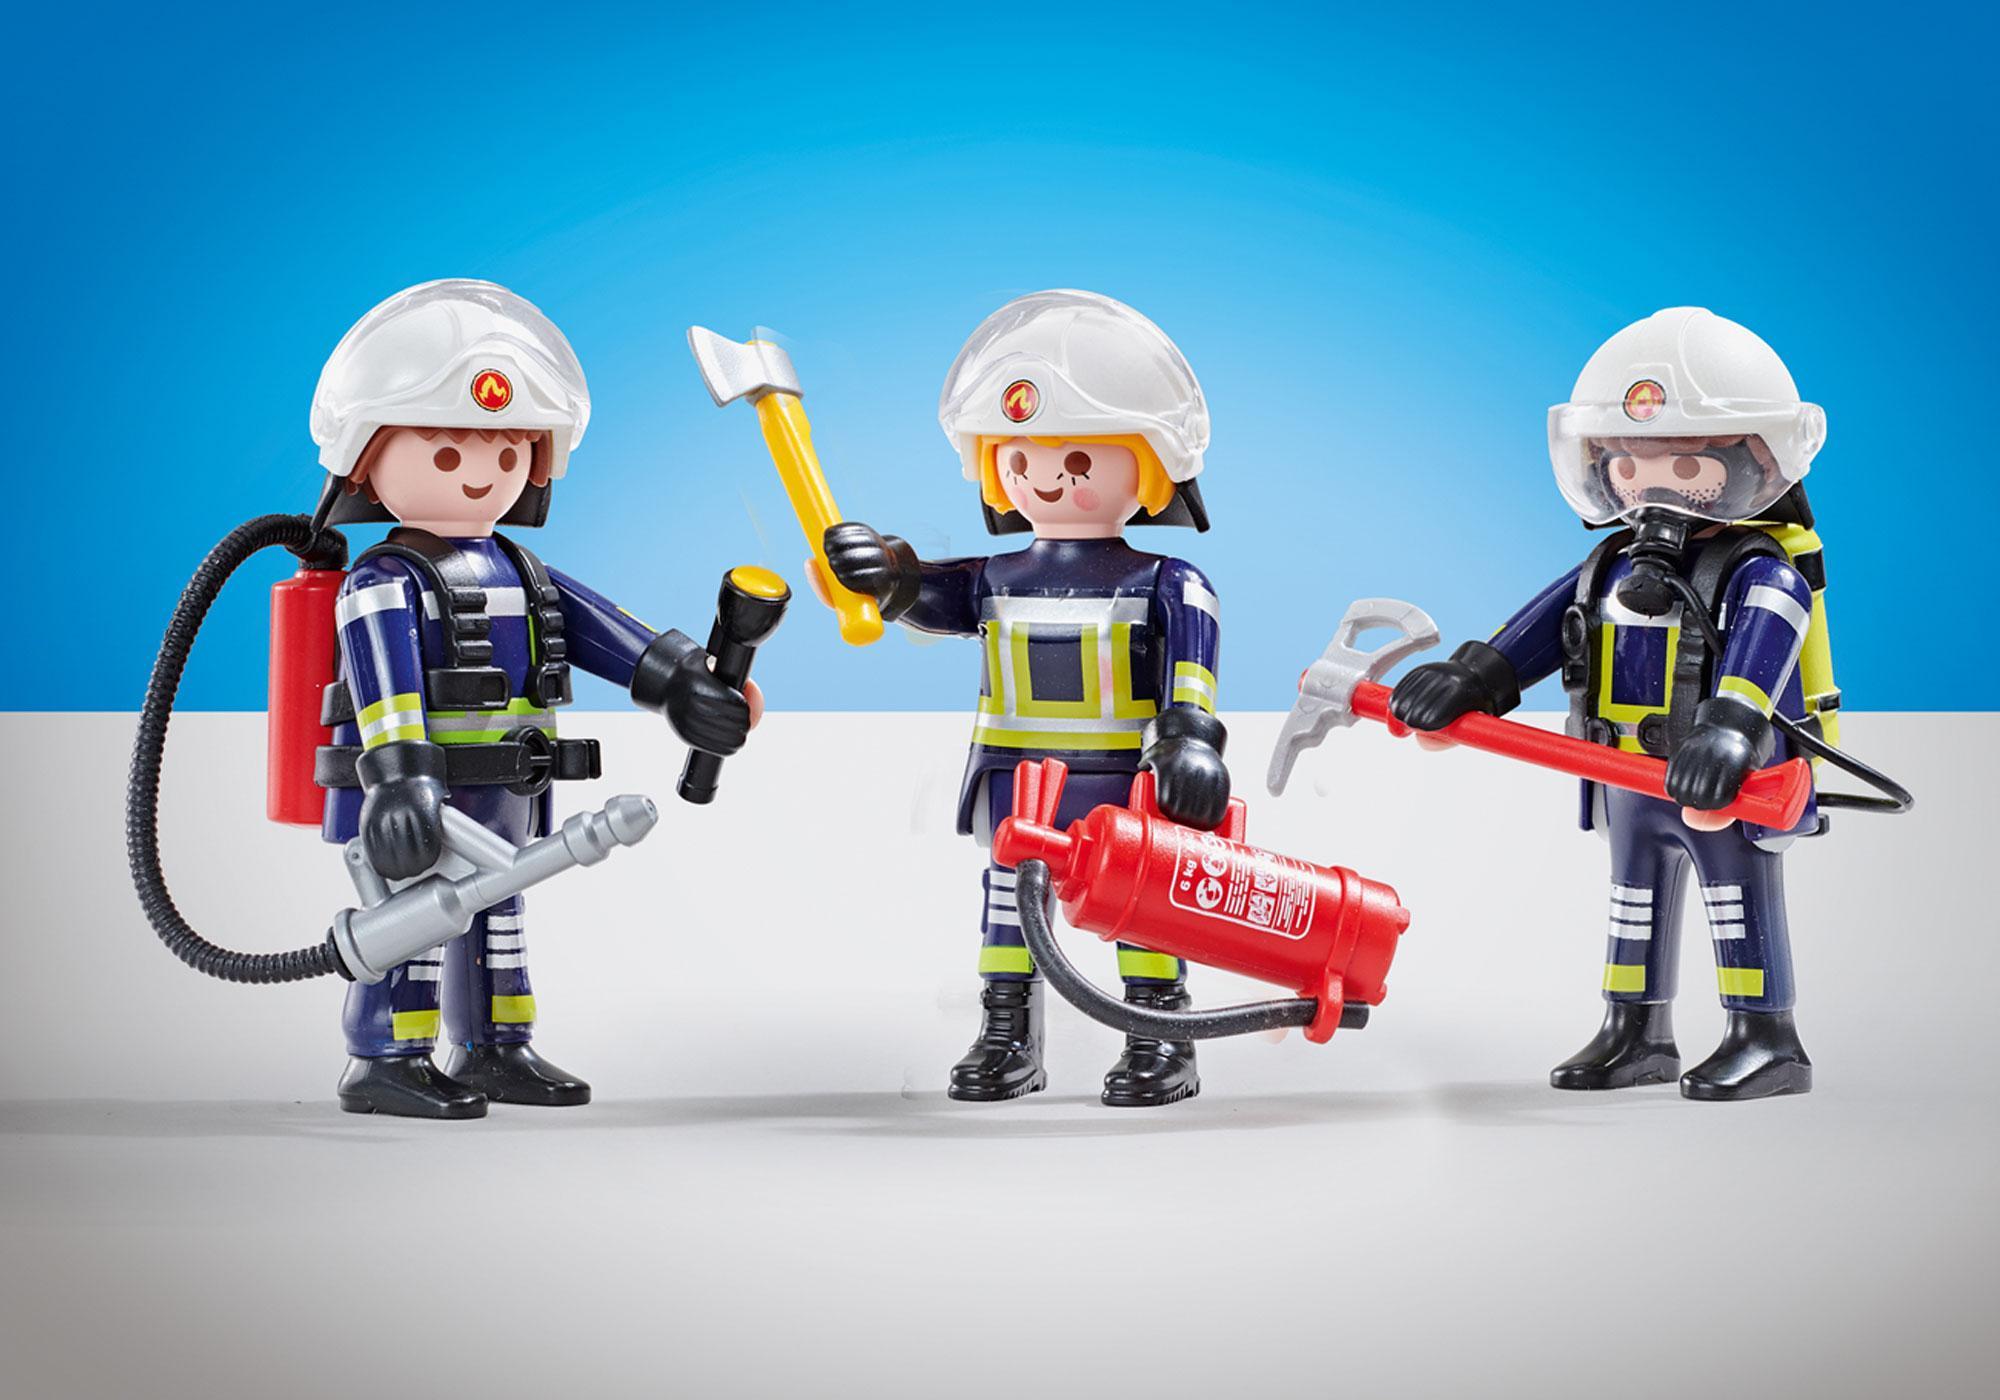 http://media.playmobil.com/i/playmobil/6586_product_detail/Feuerwehrtrupp B